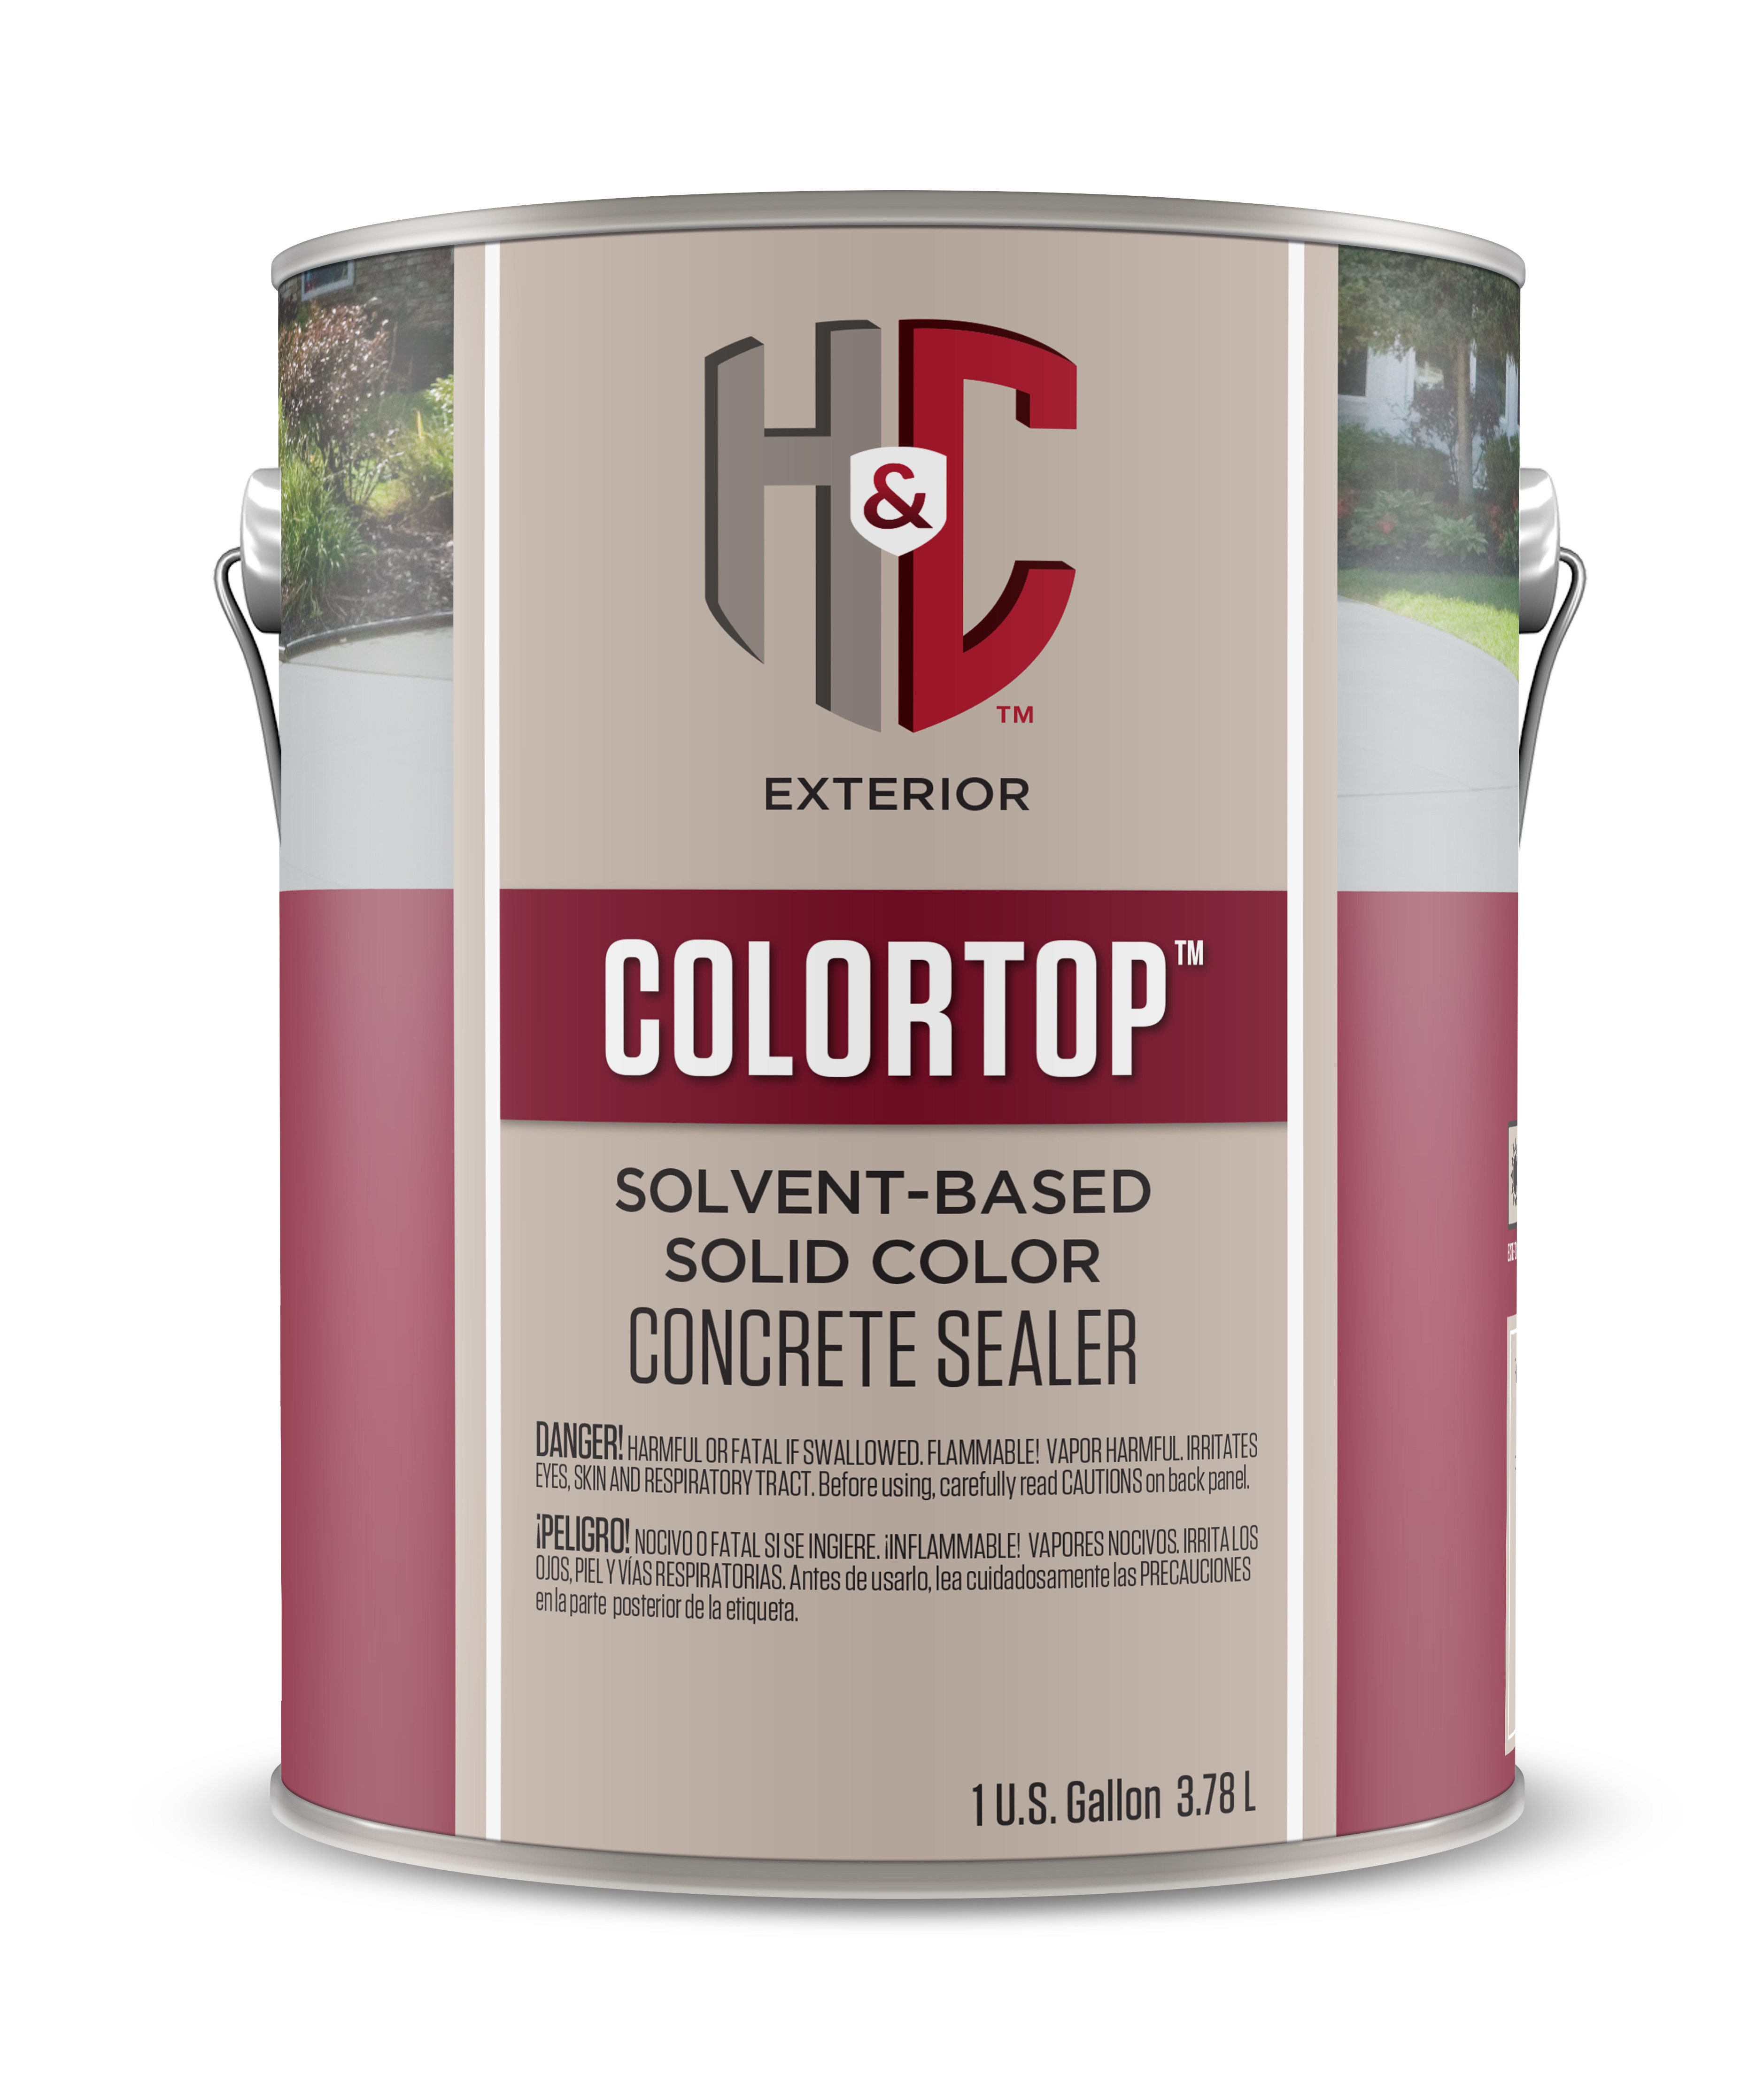 Colortop solvent based solid color concrete sealer hc concrete share nvjuhfo Gallery